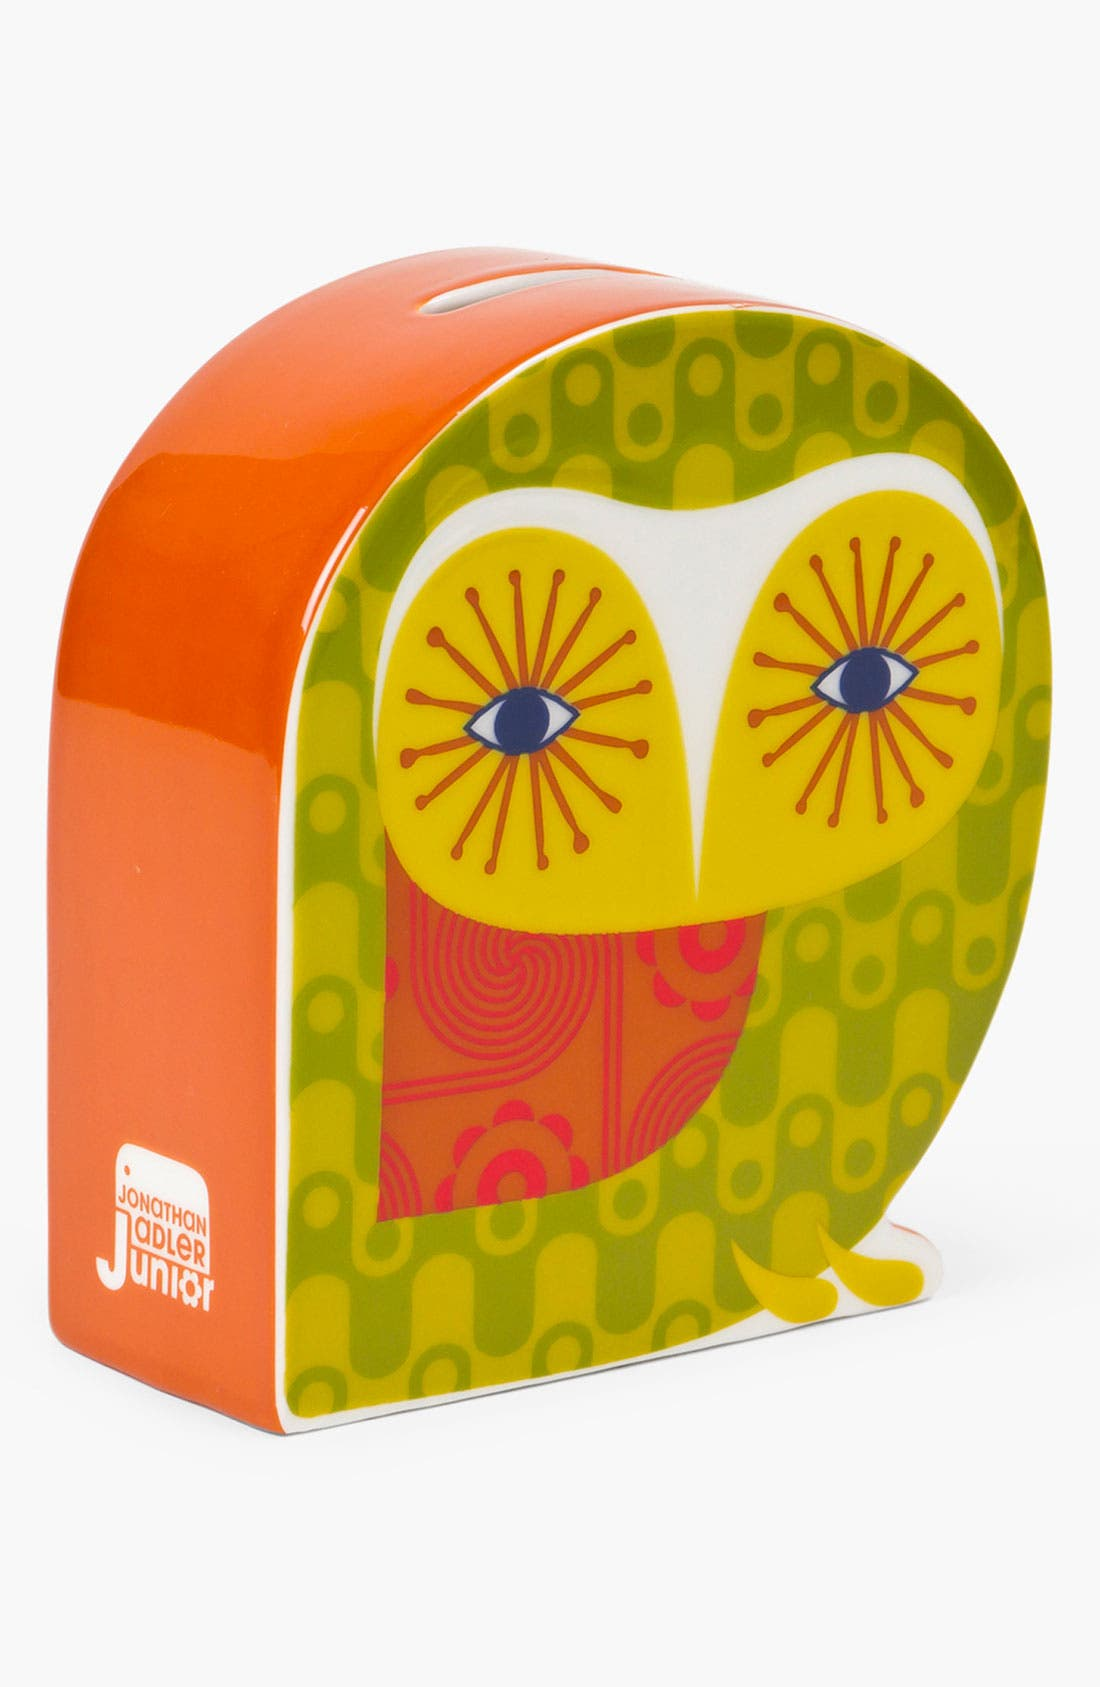 Alternate Image 1 Selected - Jonathan Adler 'Owl' Ceramic Bank